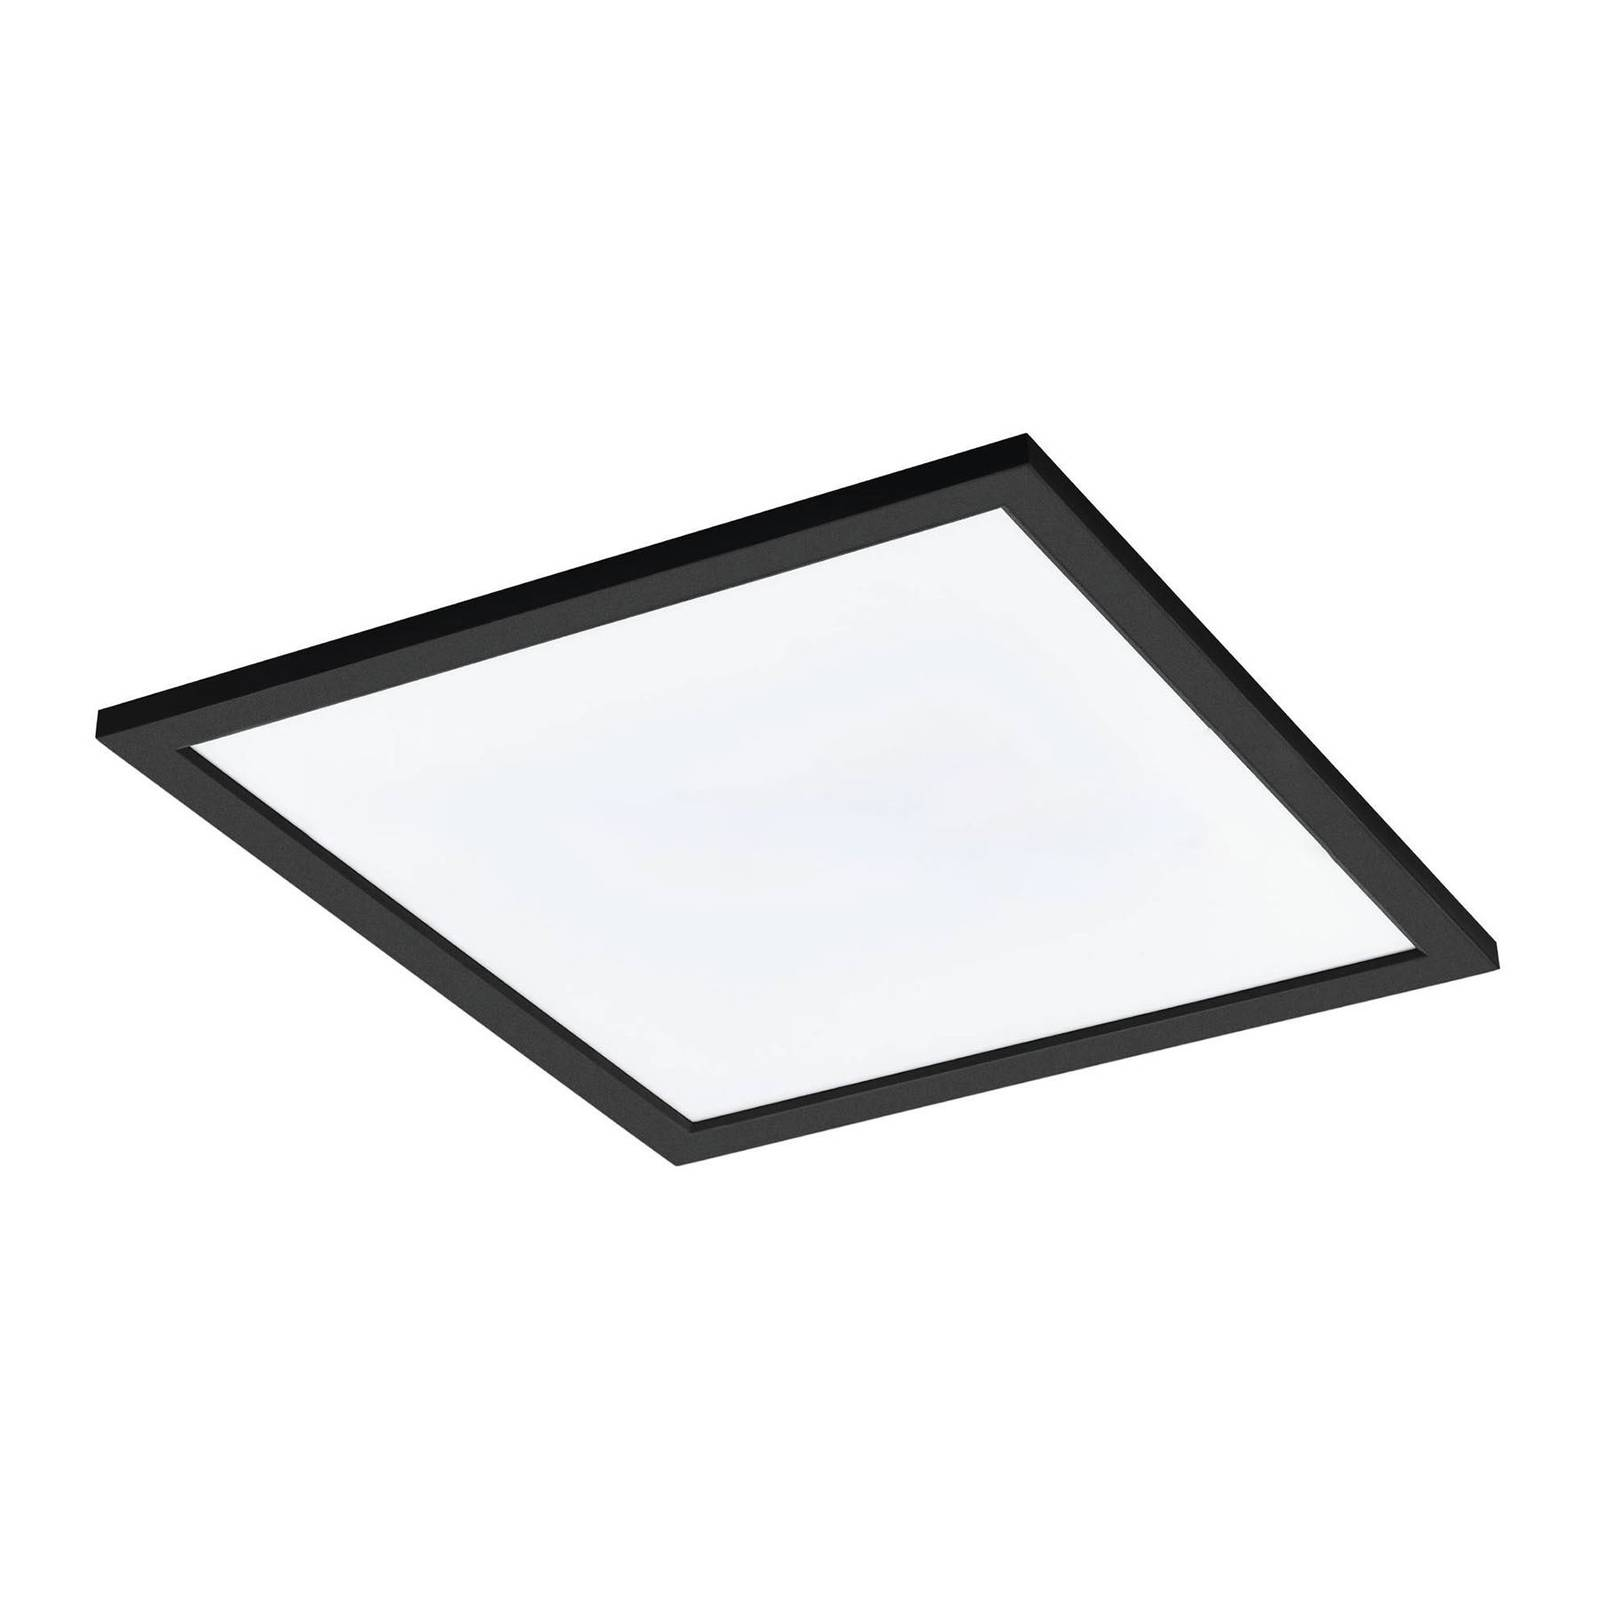 EGLO connect Salobrena-C -LED-paneeli 45 x 45 cm